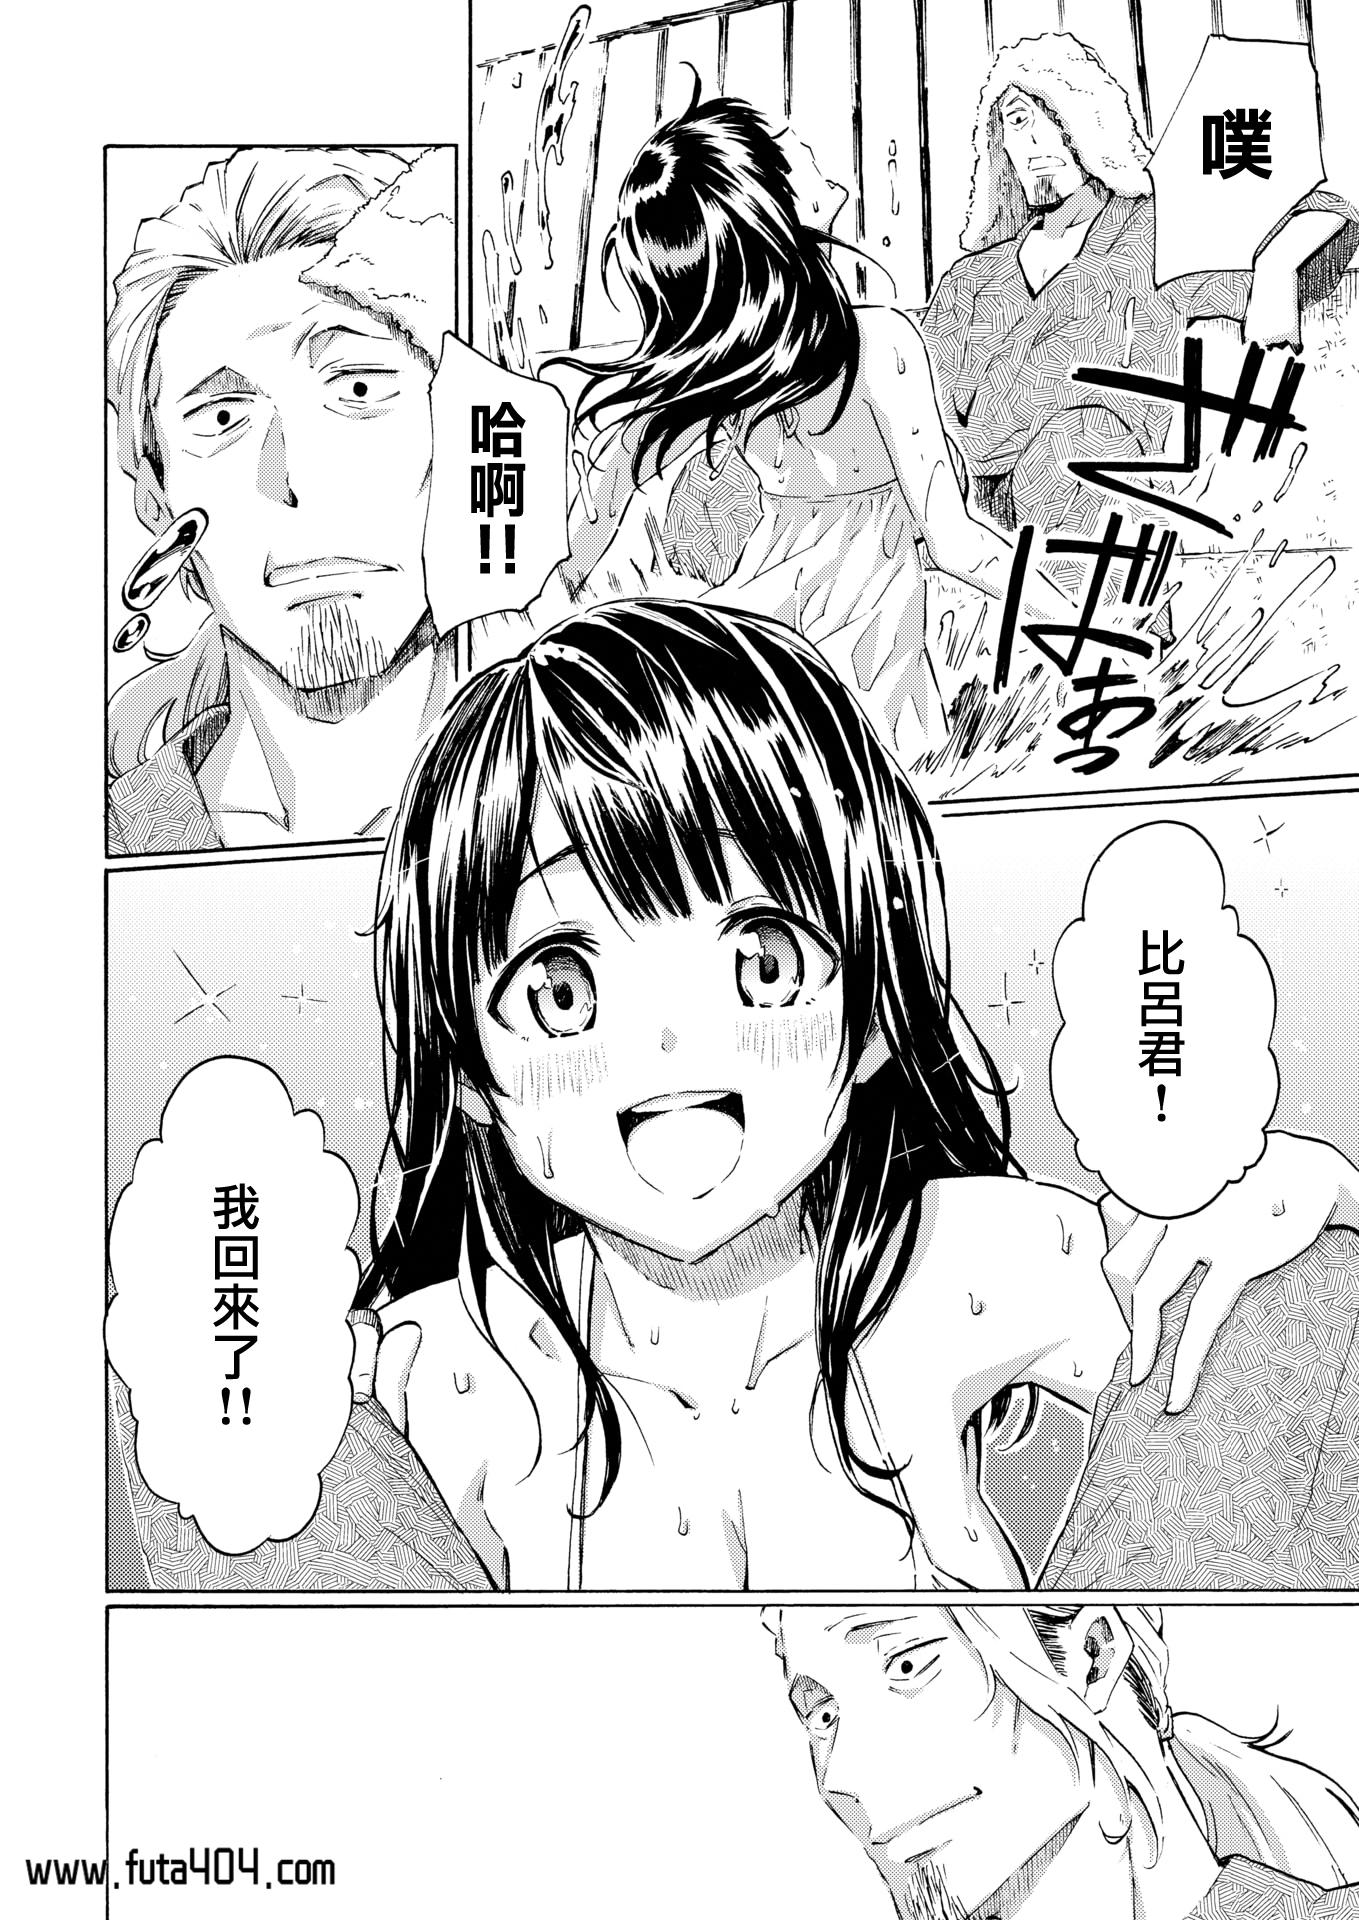 藤丸 8月の灯漫画下载 8月の灯 漫画下载 第1张